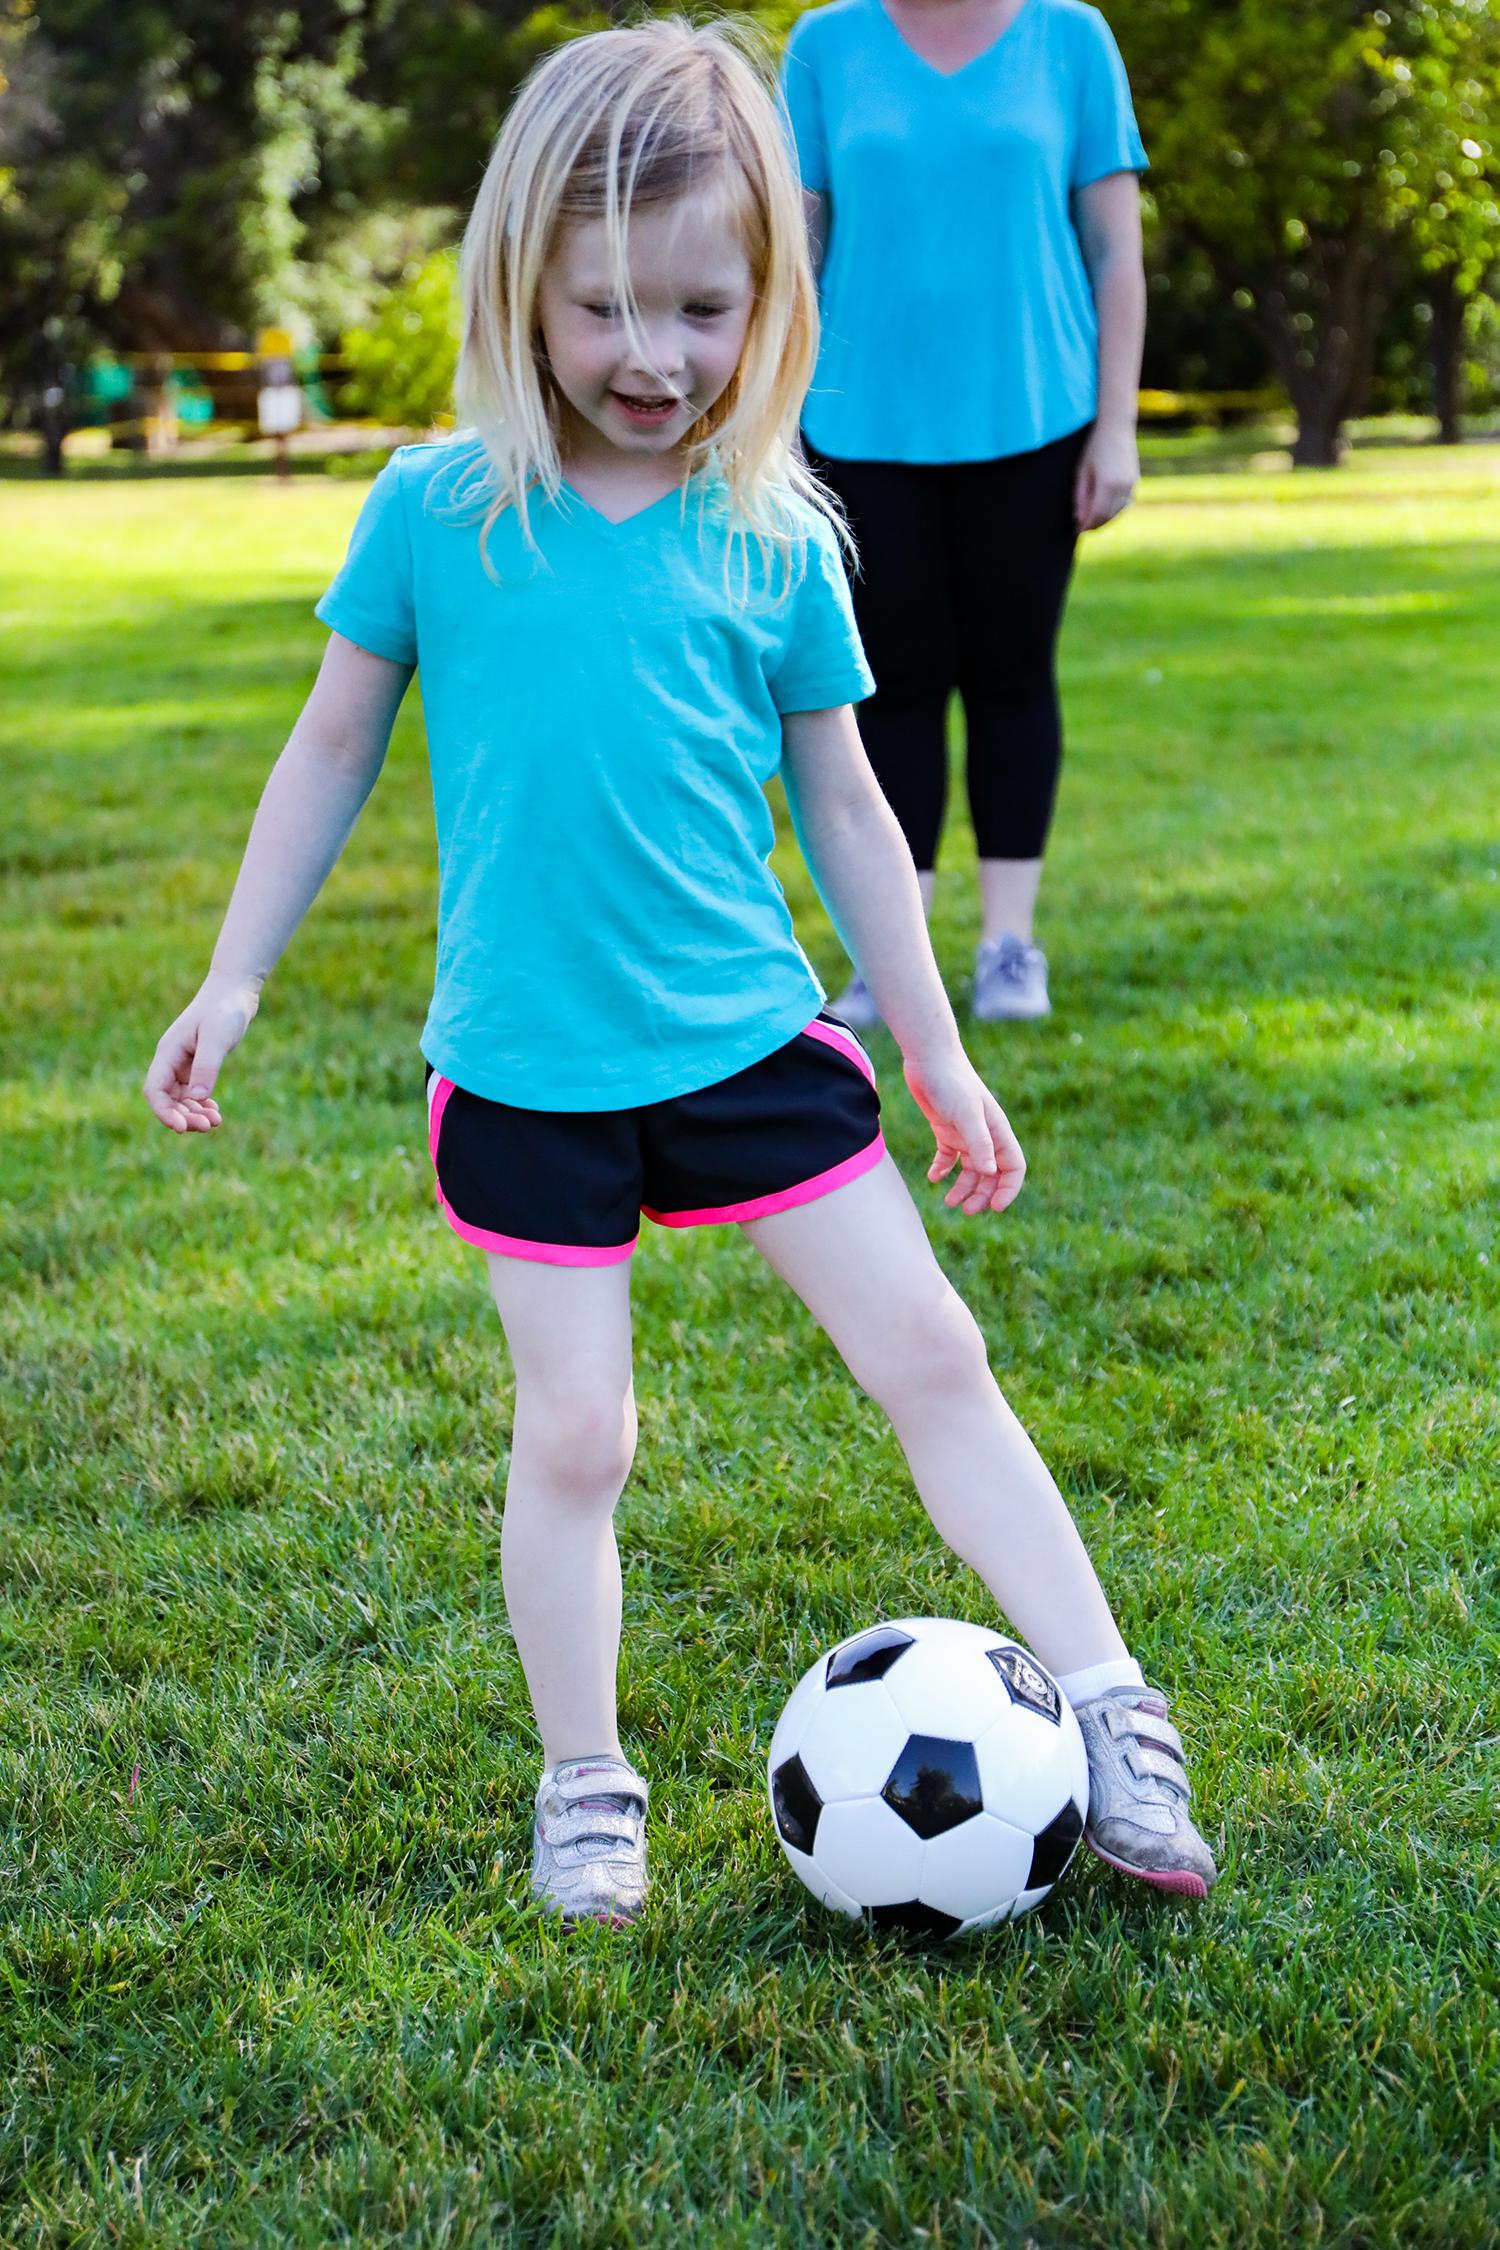 Girl Power: 5 ways Organized Sports Empower Young Girls